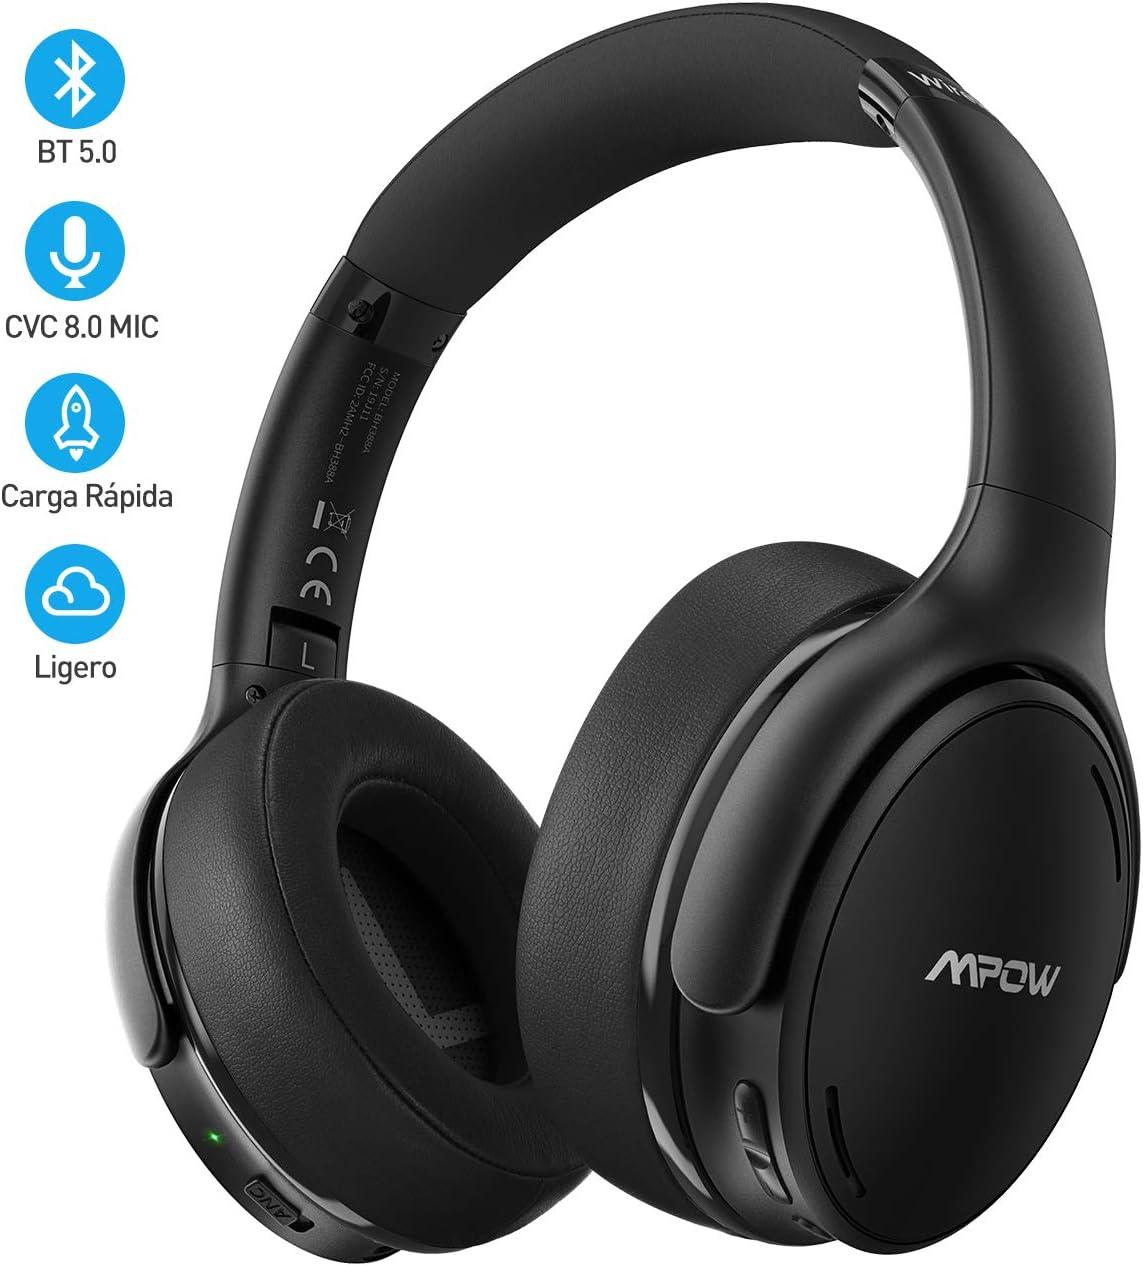 [Nuevo] Mpow H19 IPO Cascos con Cancelación de Ruido, BT 5.0, 35 Horas de Reproducir, Auriculares con Cancelación de Ruido con Hi-Fi Sonido, Auriculares Diadema Bluetooth TV, PC, Tableta, Móvil